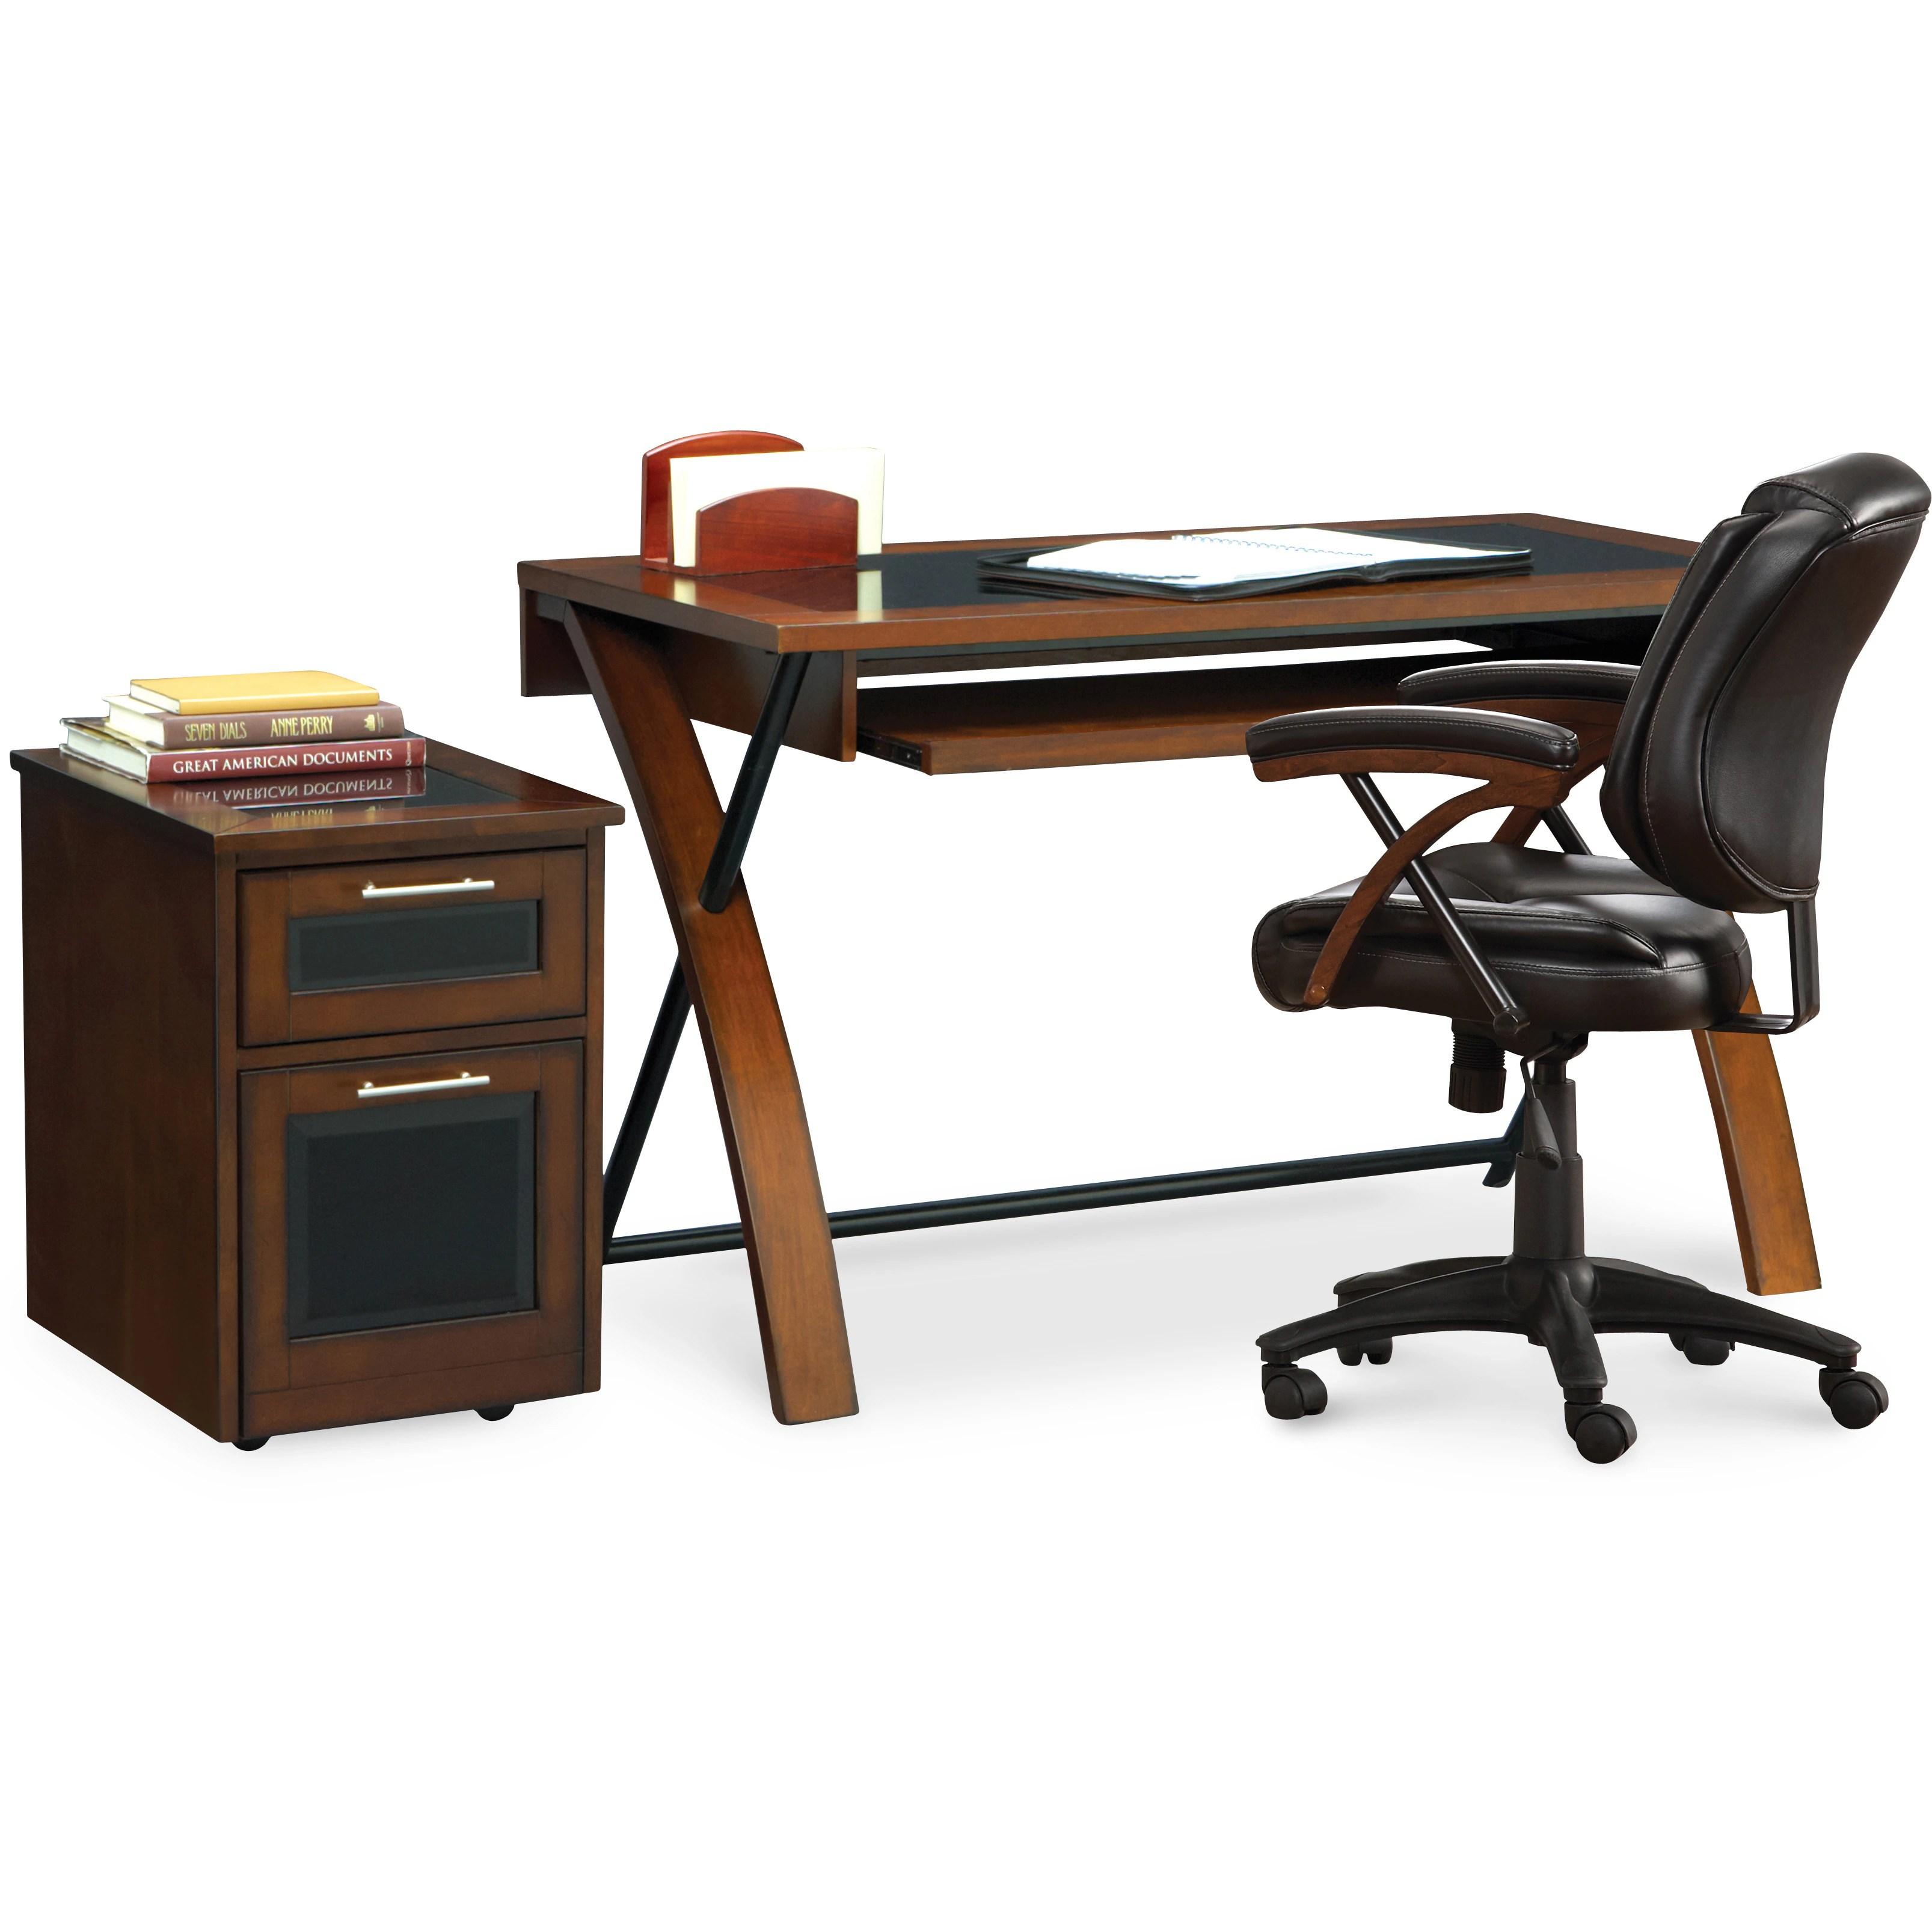 zeta desk chair kitchen island chairs shop art van free shipping today overstock com 9947381